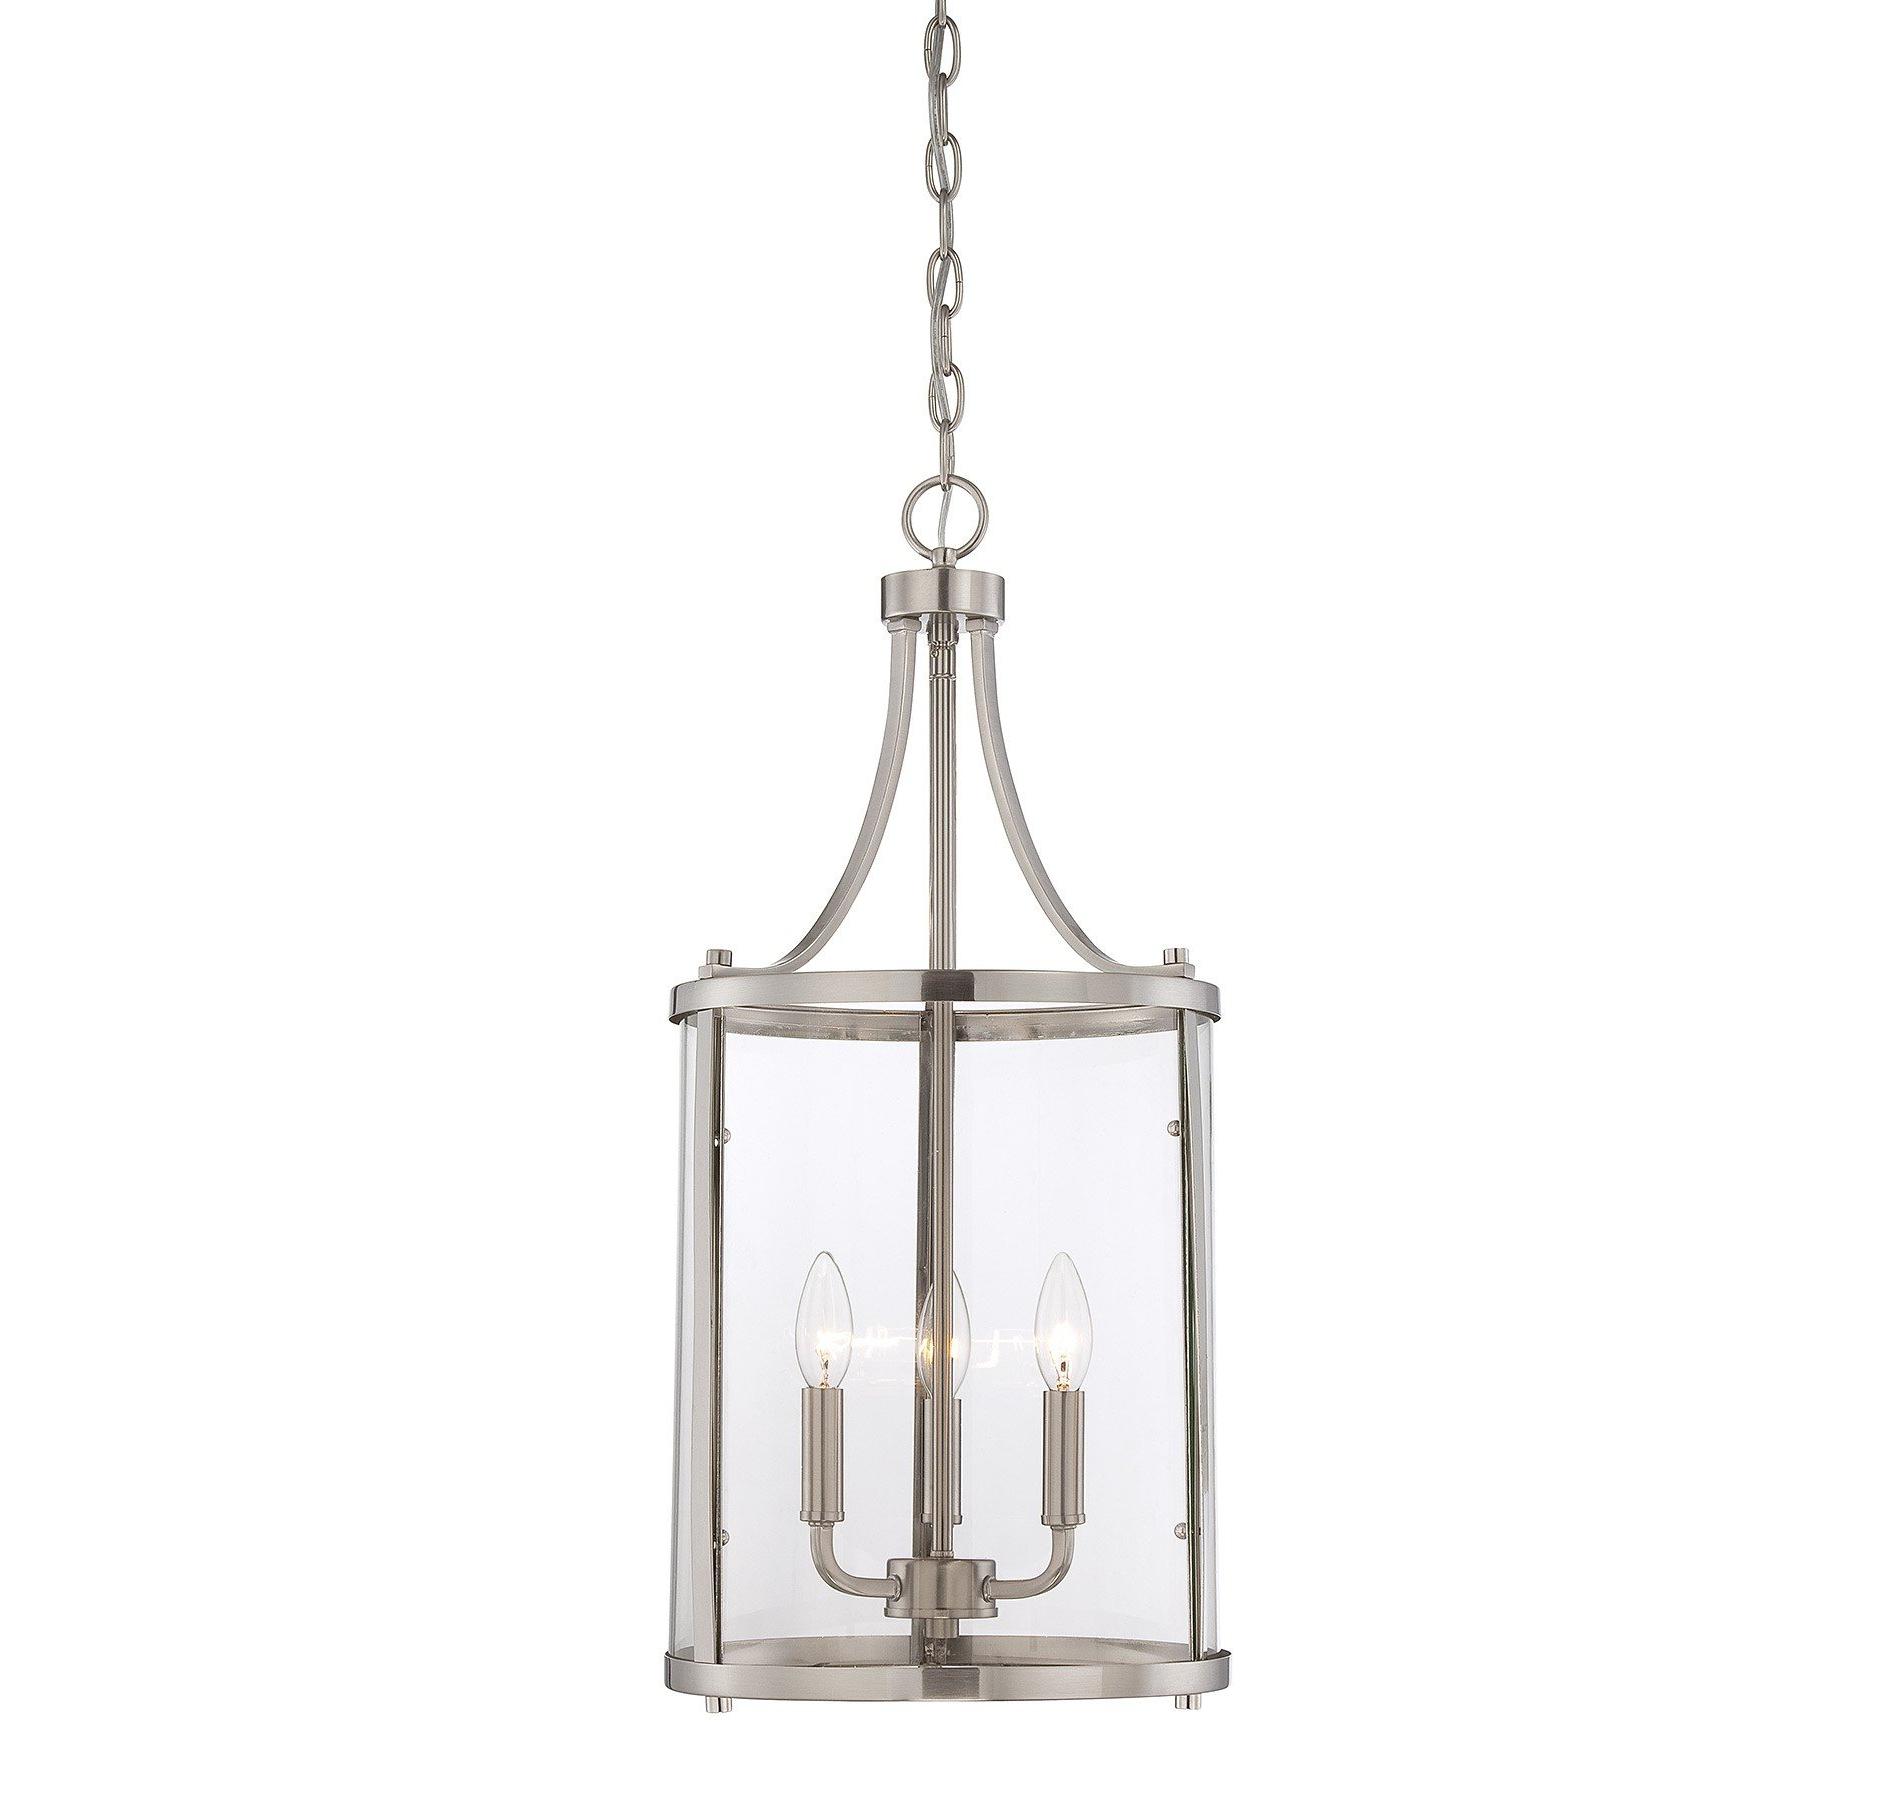 3-Light Lantern Cylinder Pendant throughout Widely used Gabriella 3-Light Lantern Chandeliers